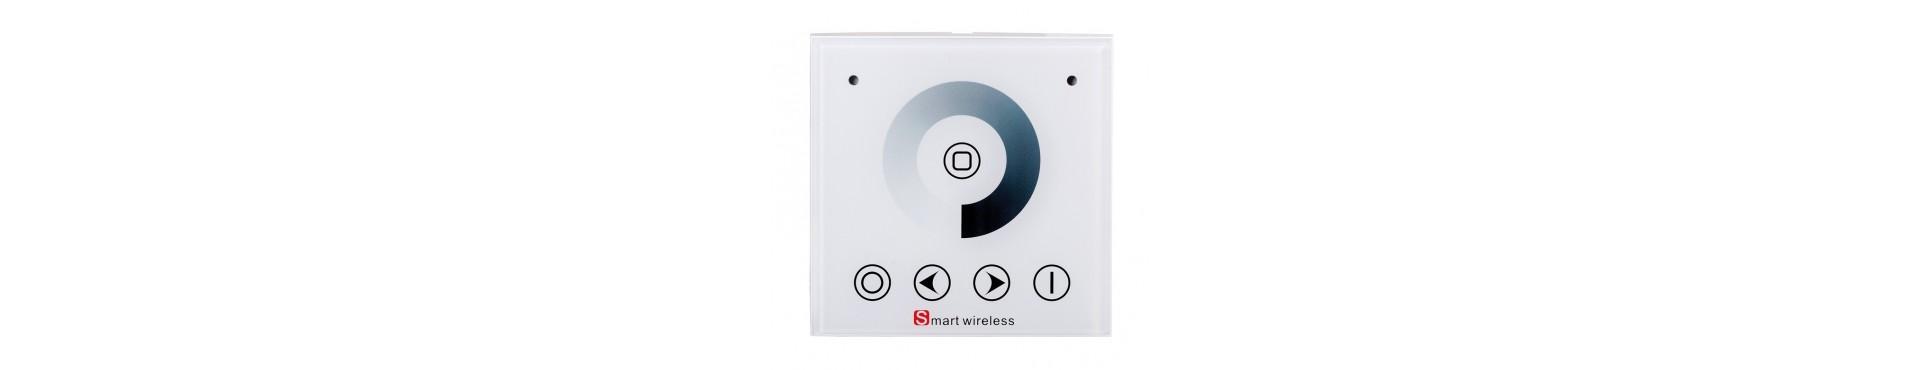 intelligente styresystemer til led belysning 2,4G